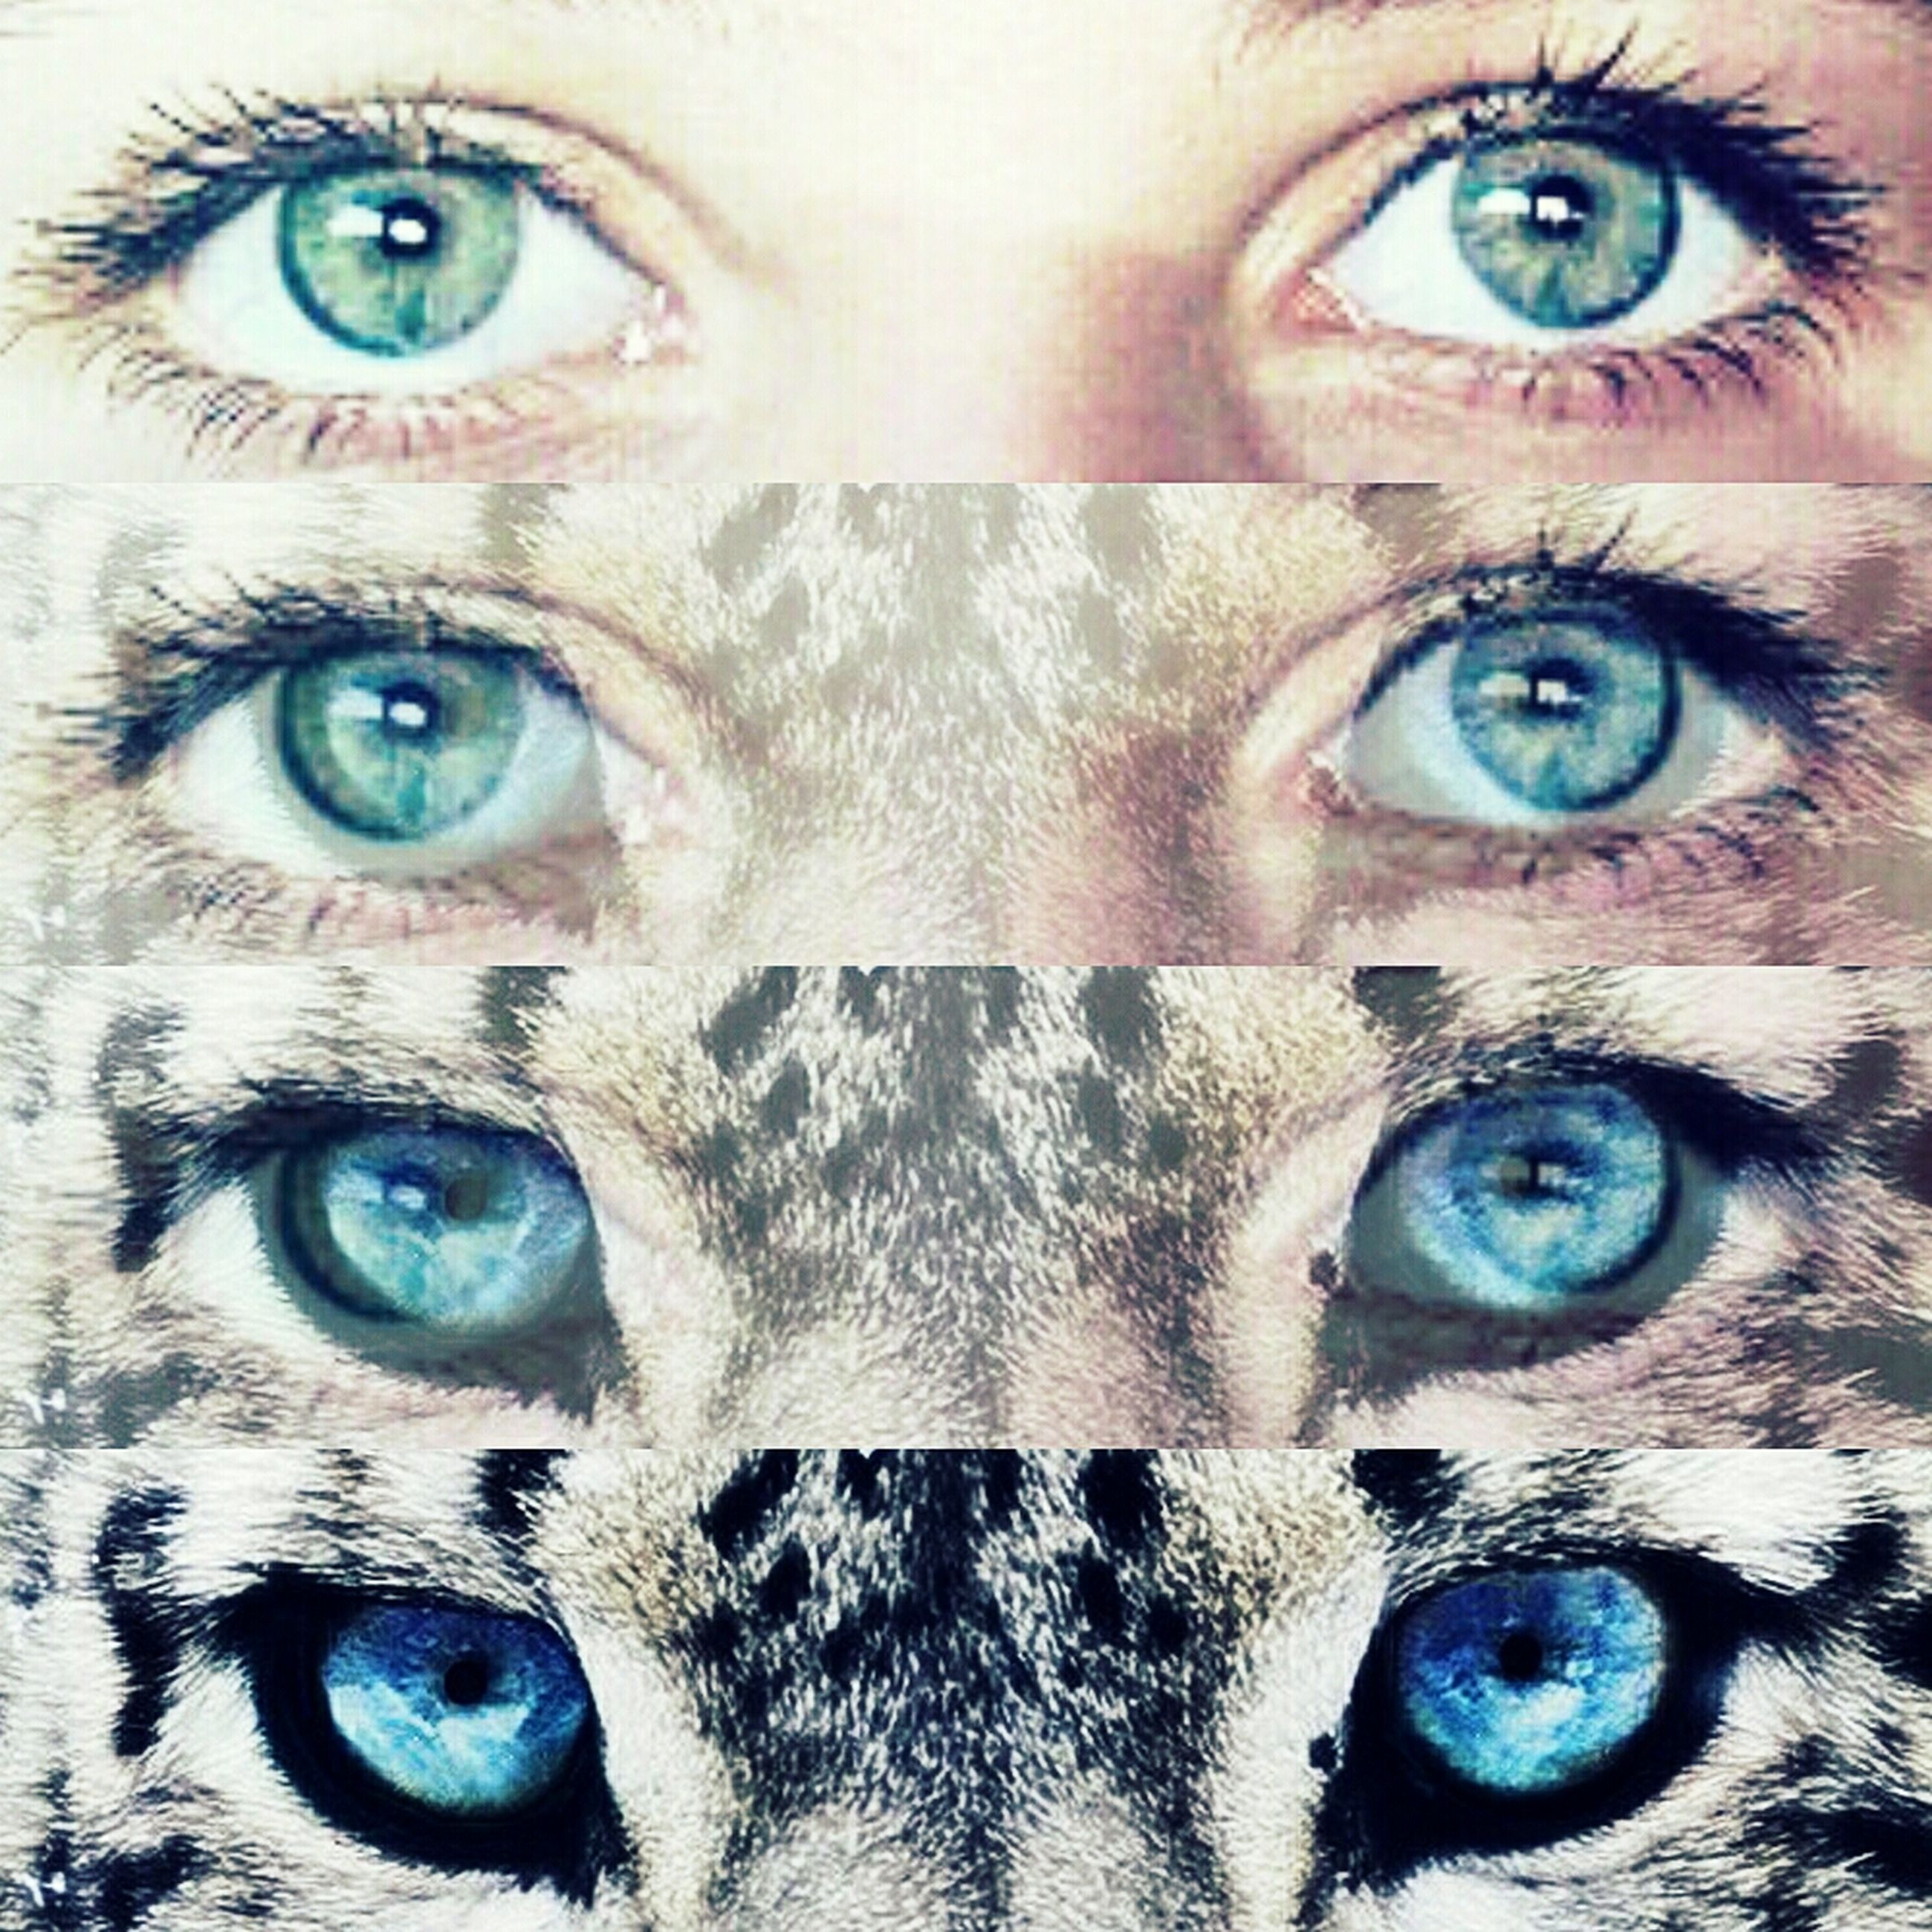 portrait, looking at camera, full frame, human eye, close-up, backgrounds, front view, human face, blue eyes, headshot, part of, eyesight, pattern, detail, animal eye, eyelash, person